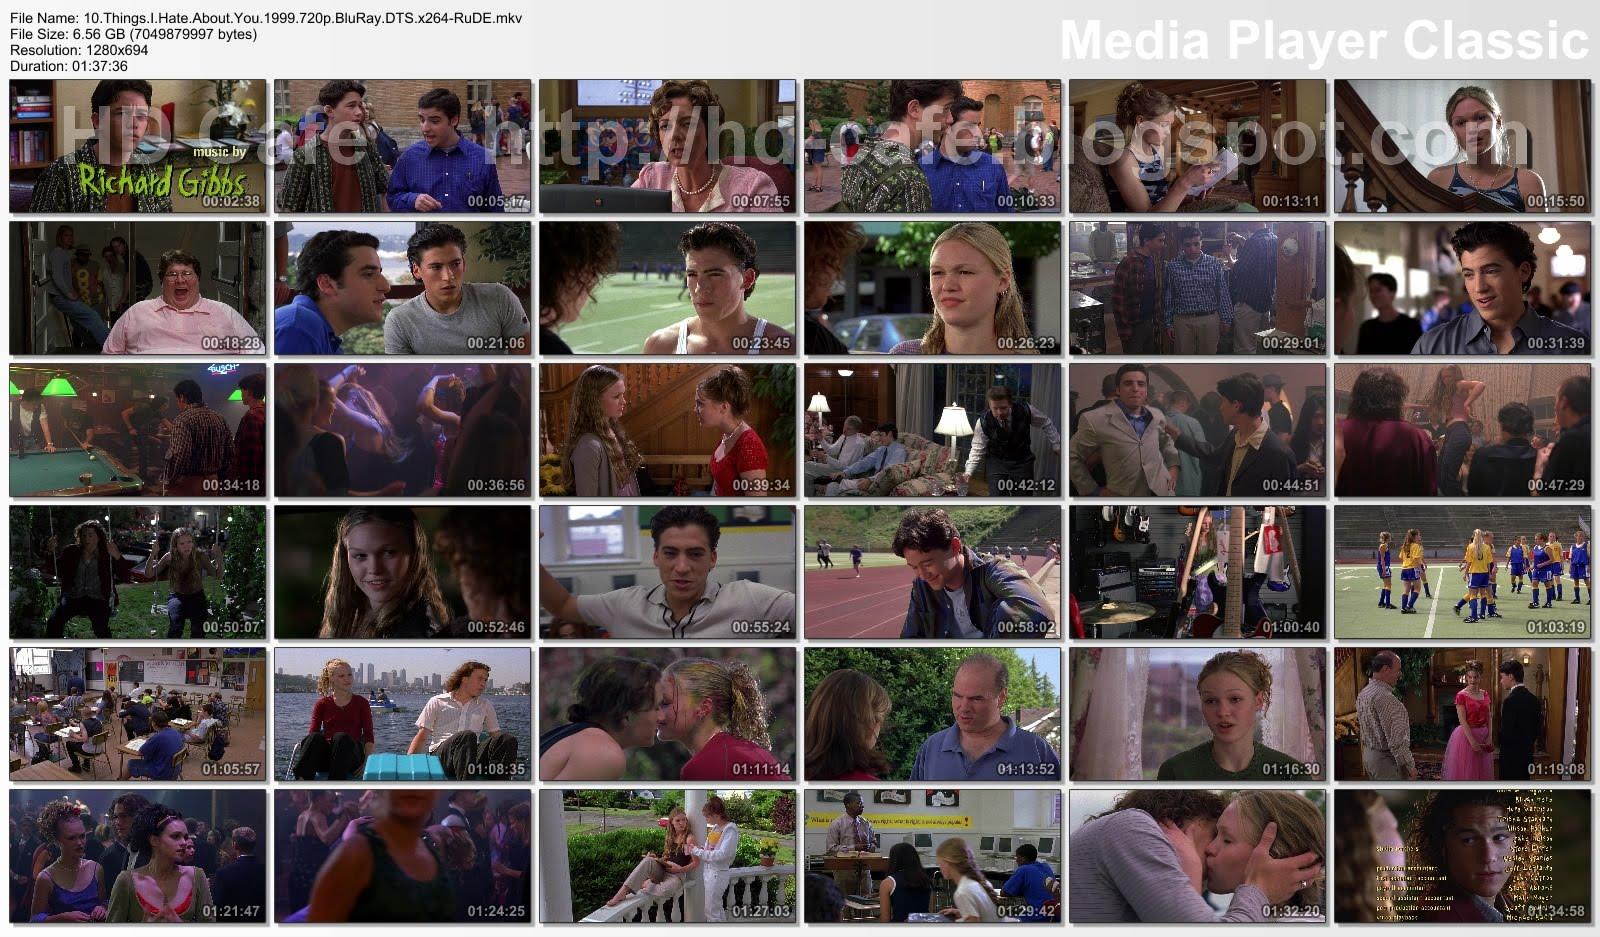 http://4.bp.blogspot.com/-JeQf5BY8CQs/TrvoftB844I/AAAAAAAAB28/hrCX1AodX_A/s1600/10-Things-I-Hate-About-You-1999-thumbs.jpg